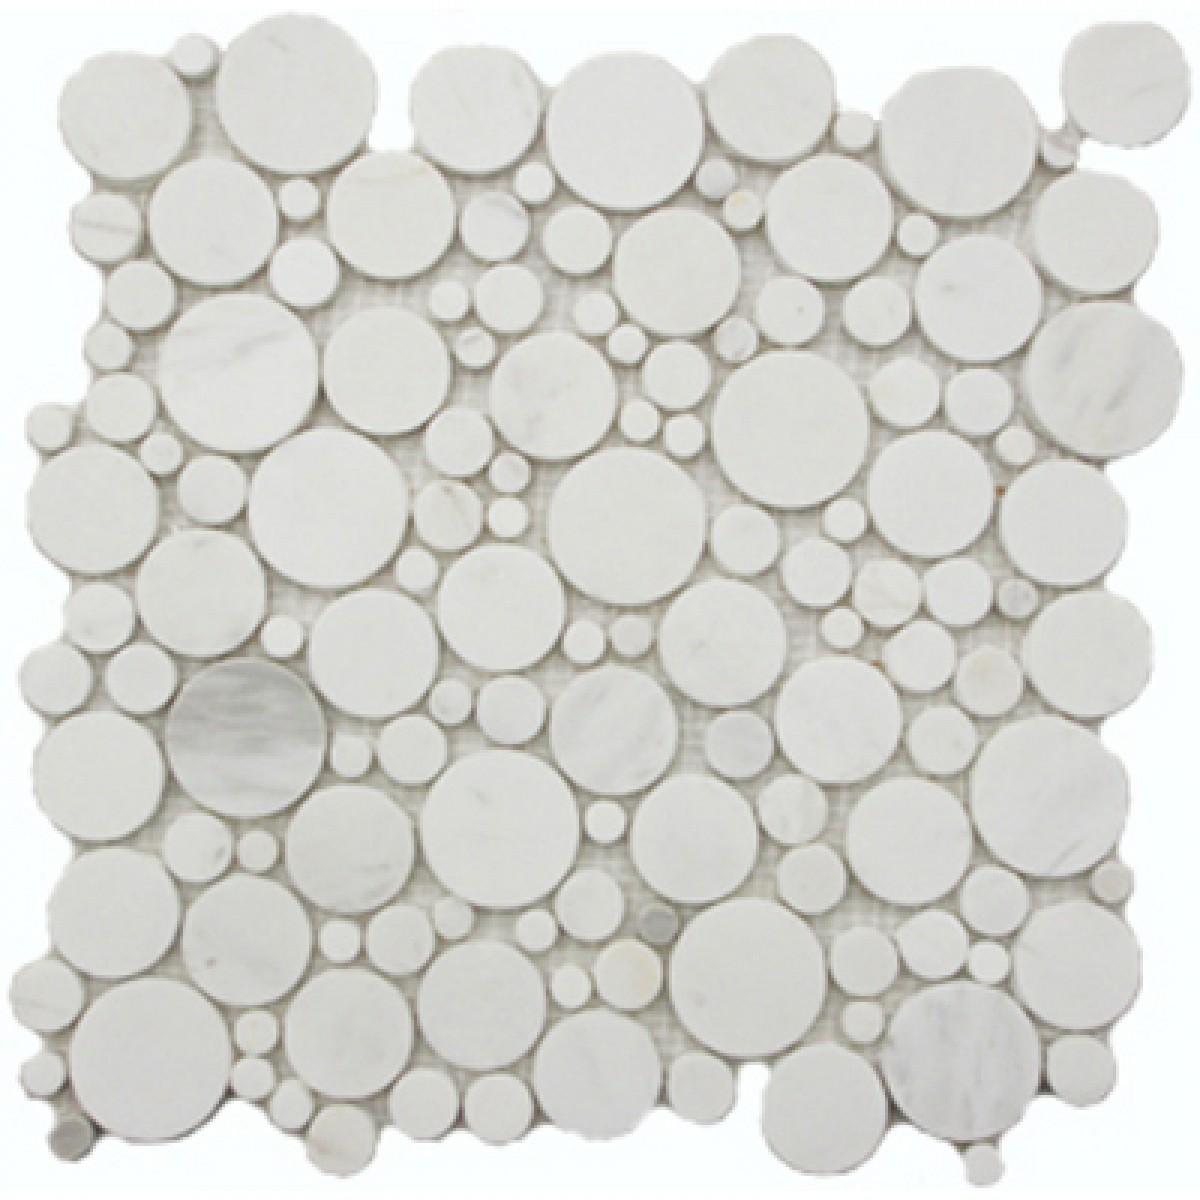 White Flat Pebble Marble Mosaic Circle Tile Mesh Backed Sheet